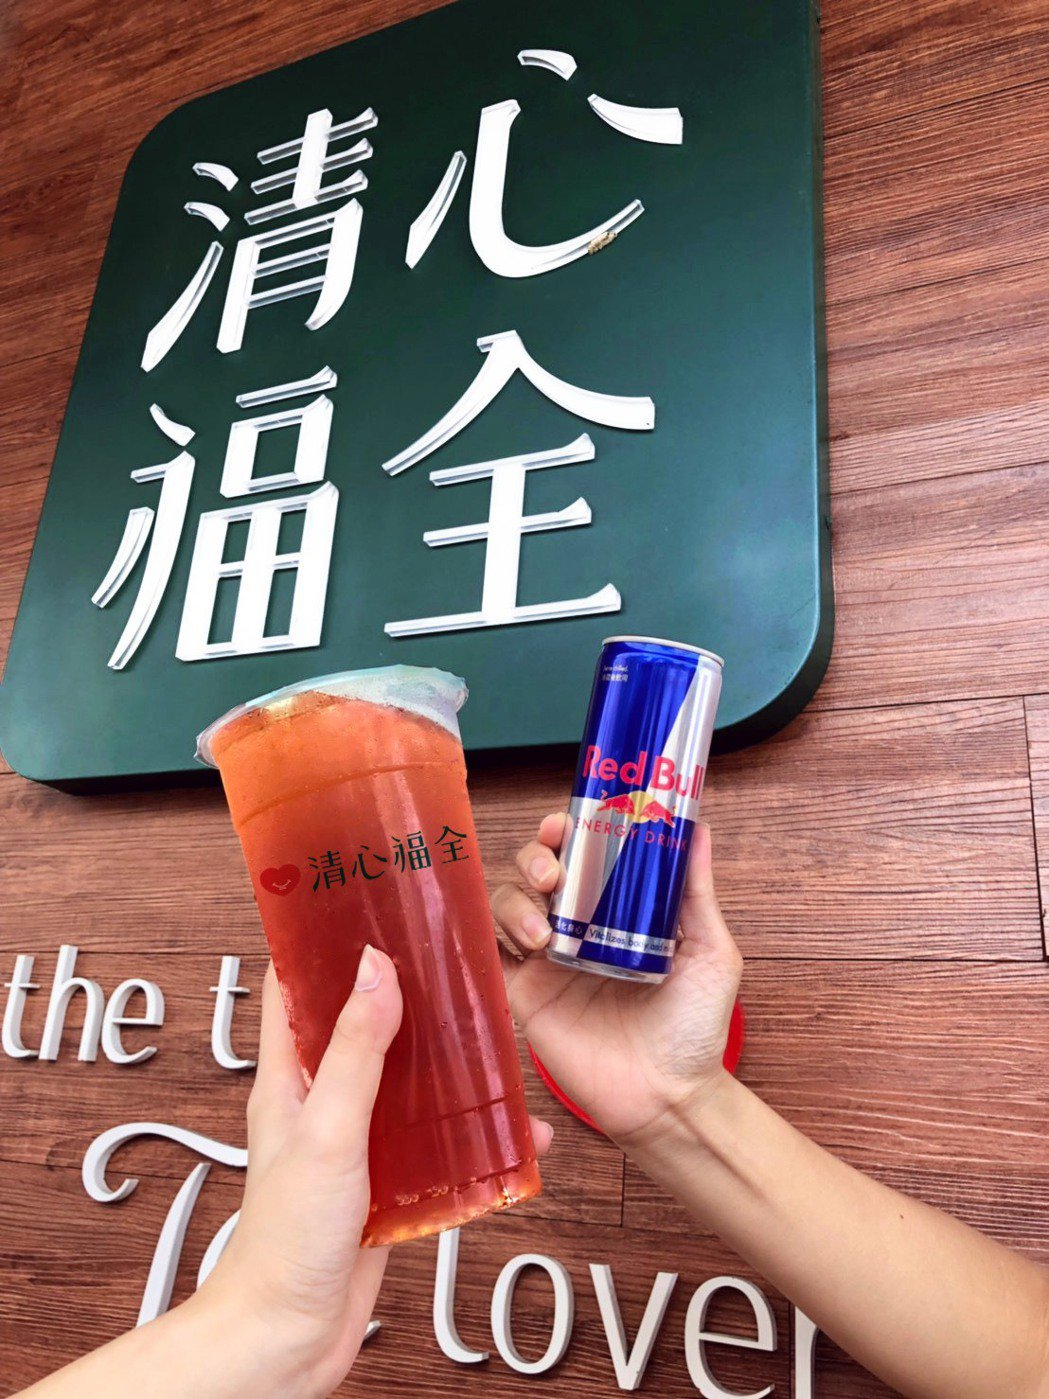 「Red Bull紅牛能量紅茶」,嚴選招牌「錫蘭紅茶」加入整罐「Red Bull...